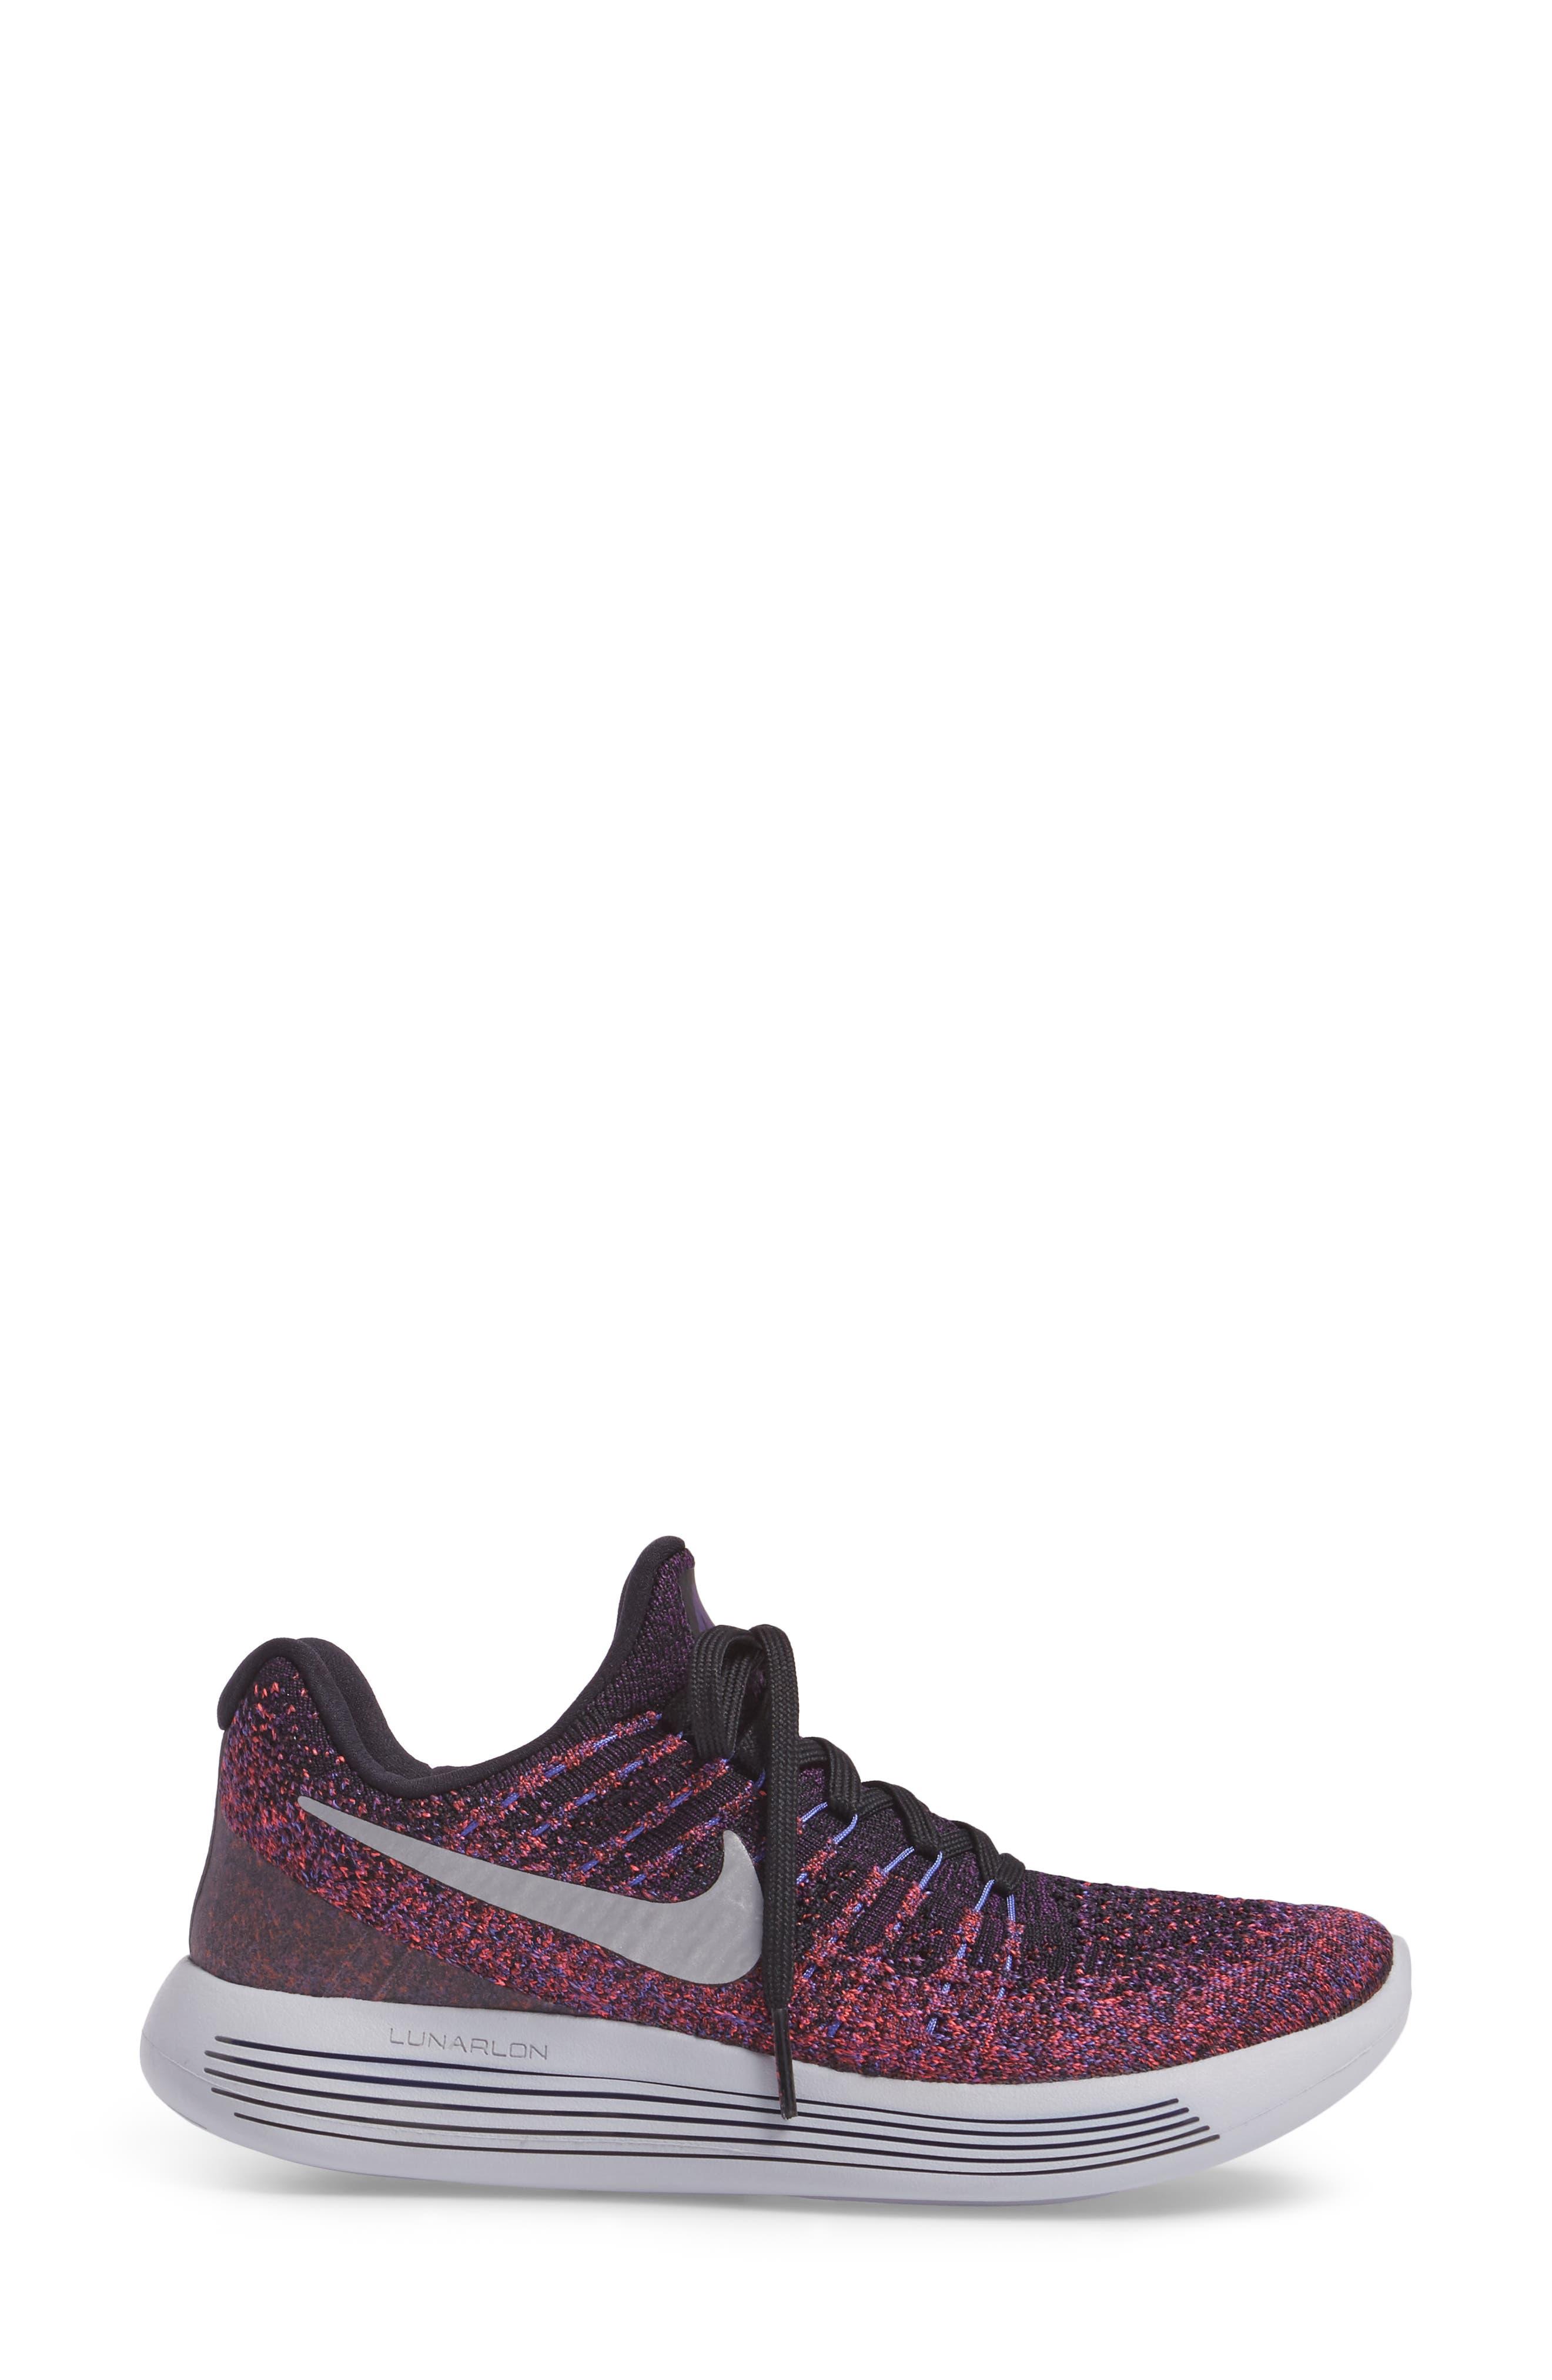 LunarEpic Low Flyknit 2 Running Shoe,                             Alternate thumbnail 48, color,